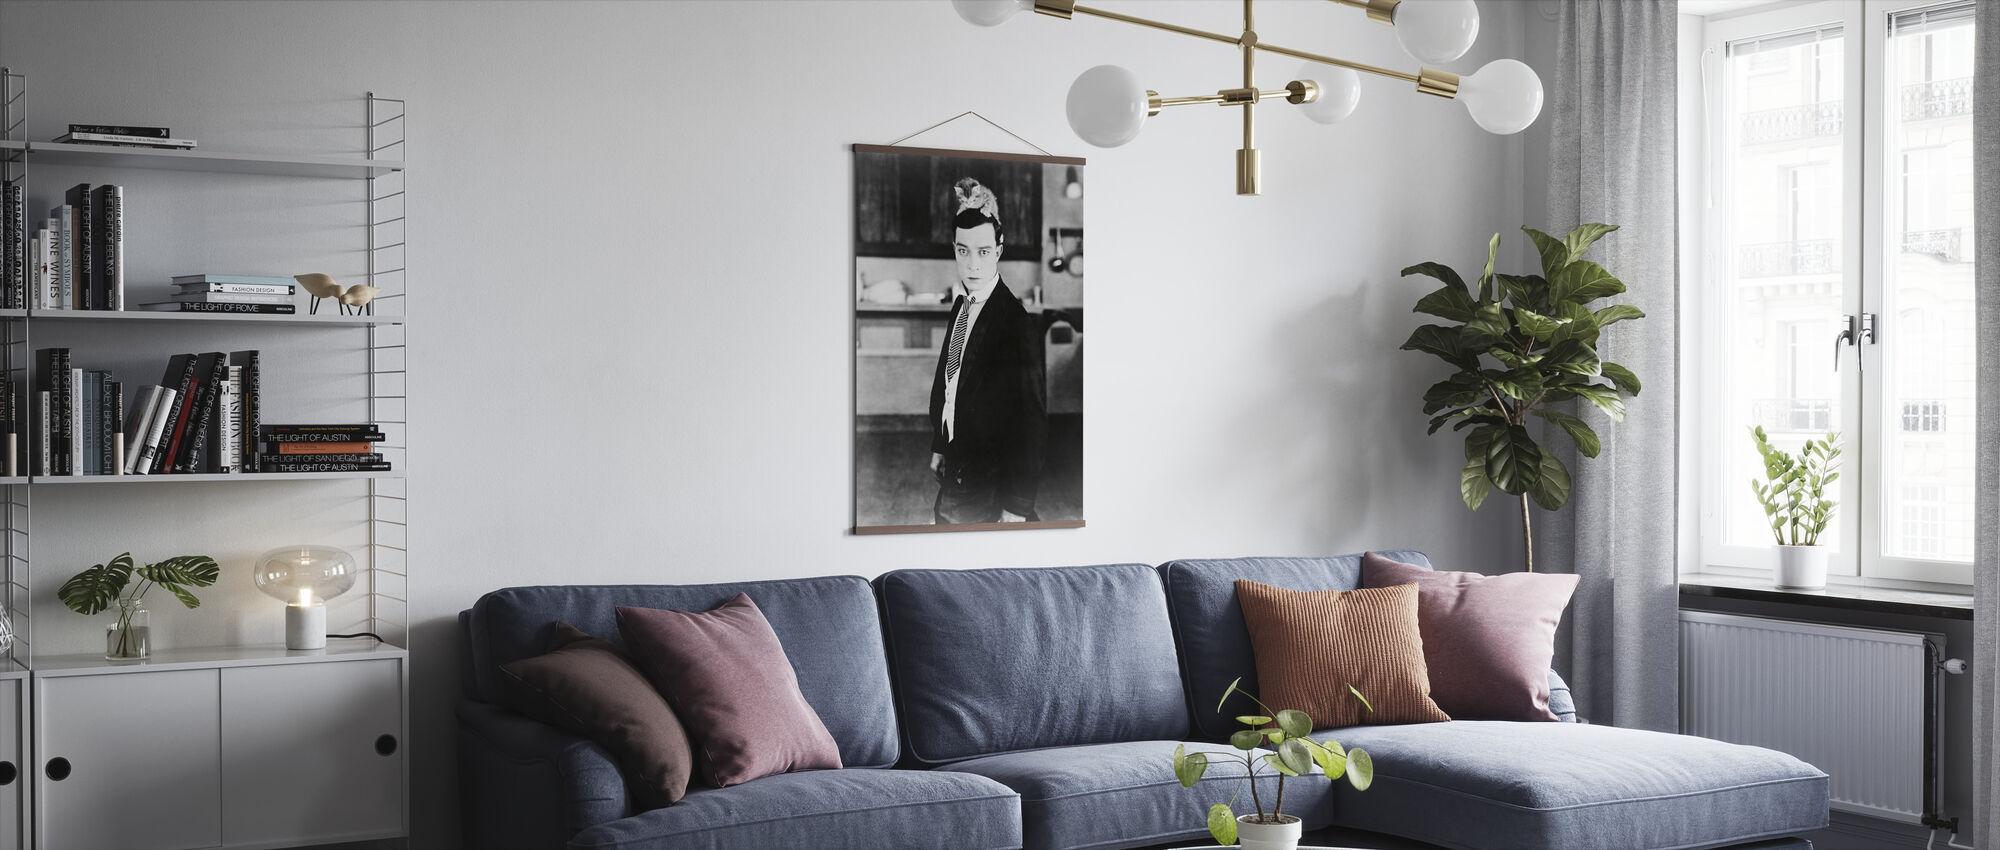 Elektrisk hus - Buster Keaton - Plakat - Stue